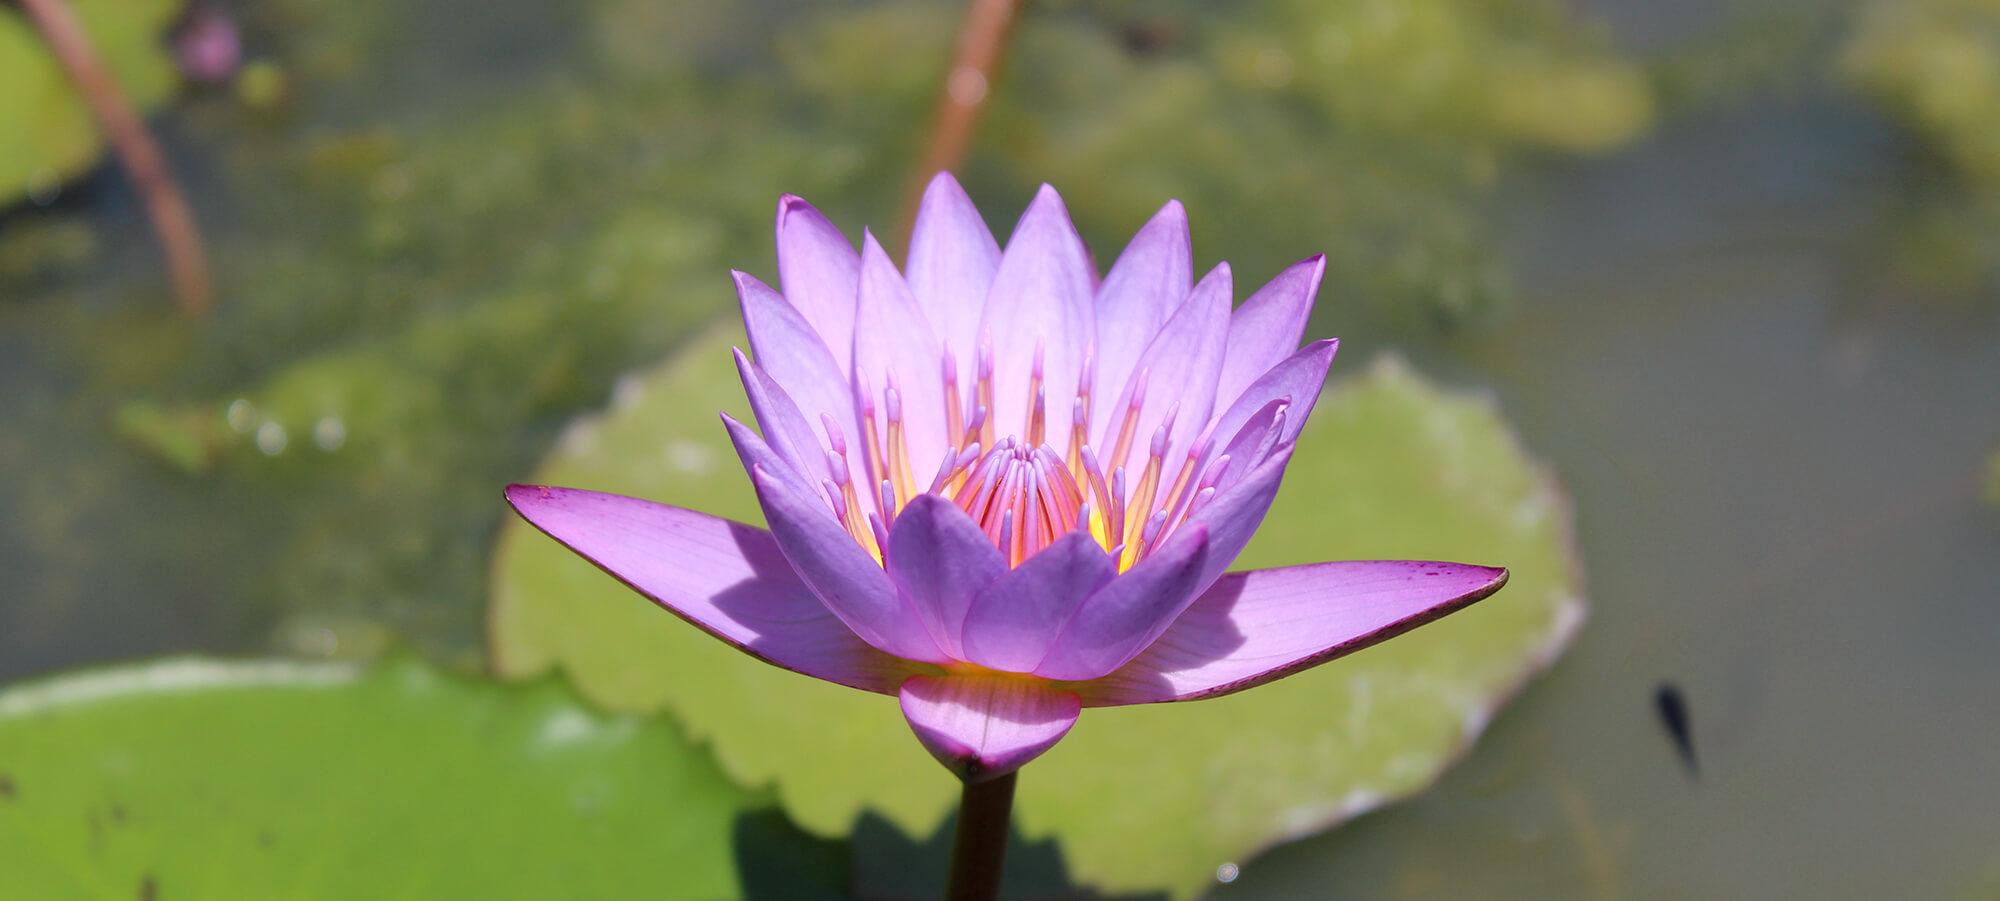 Yogaflows in Freystadt - Kontakt - Lotusblüte